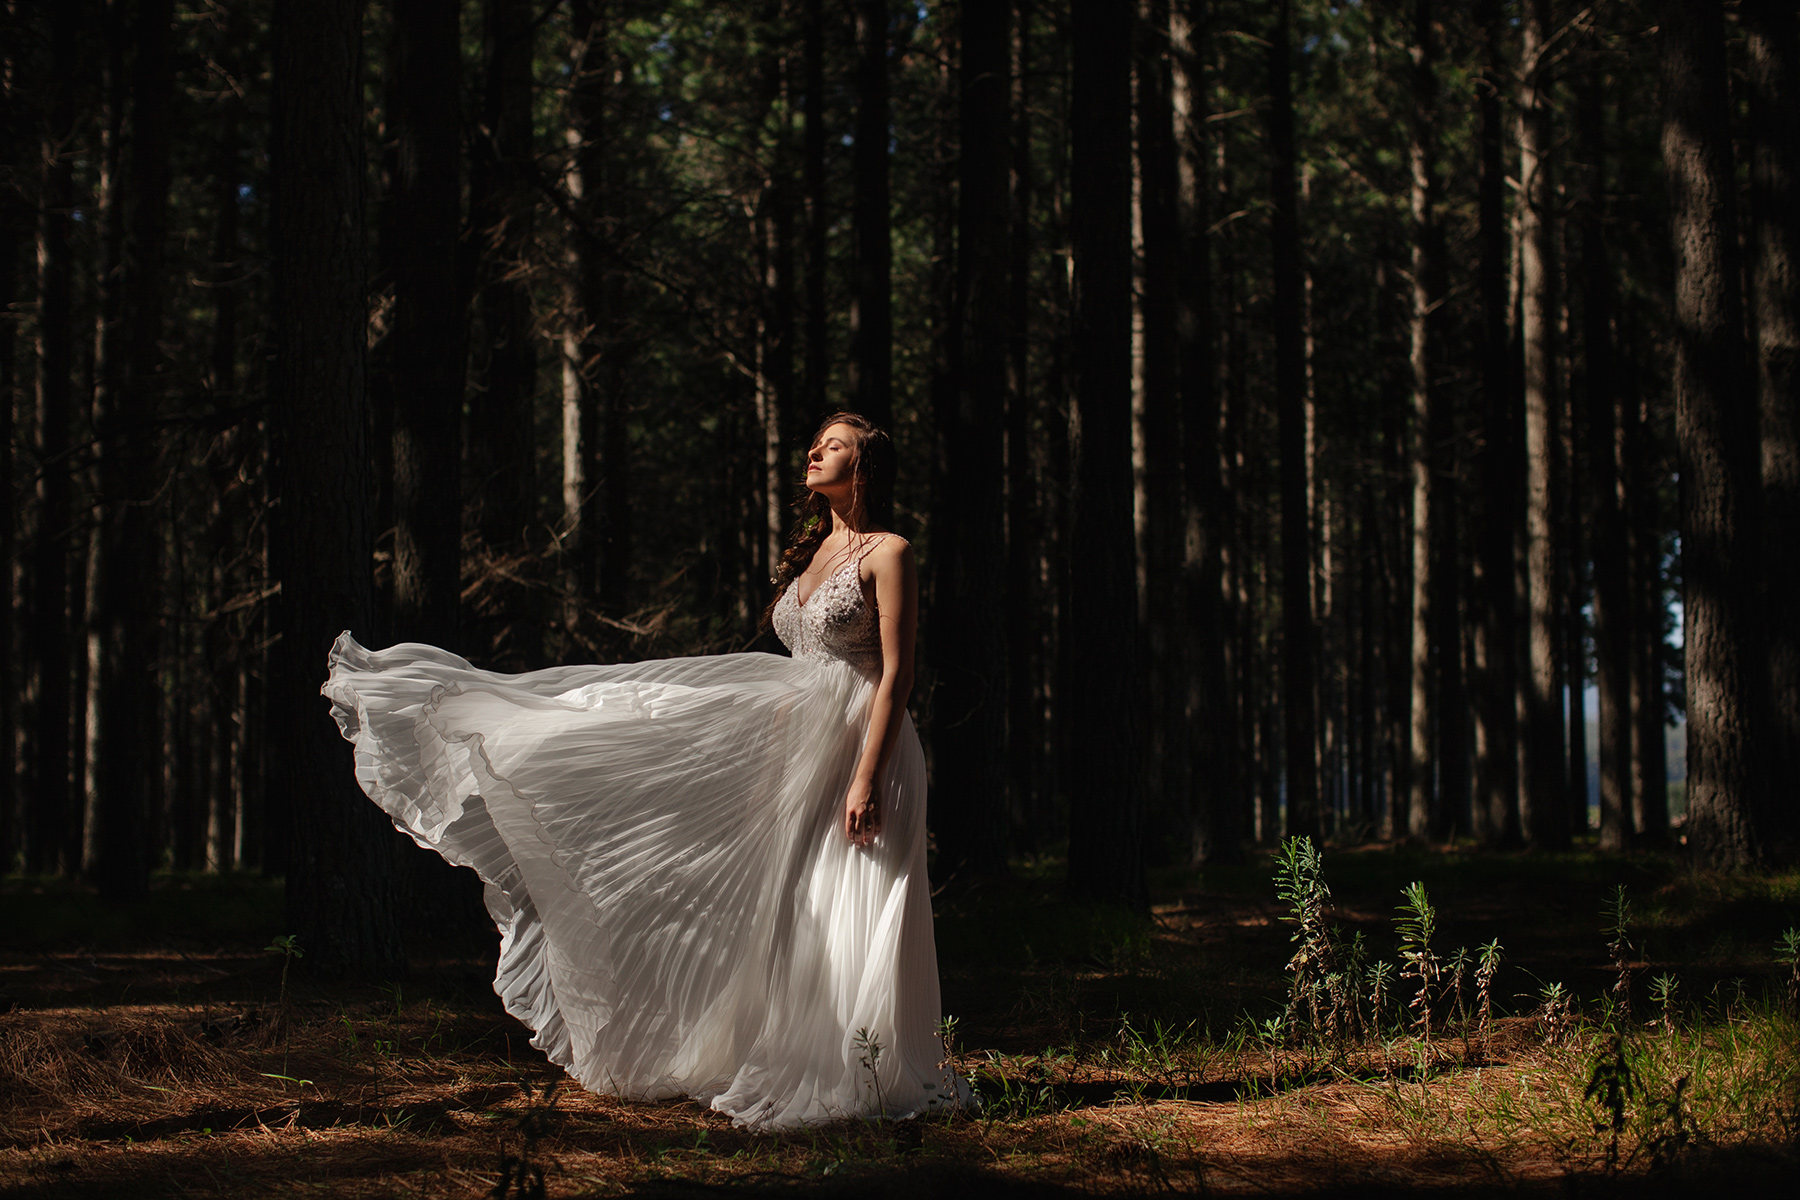 Bridal11Nov2018_HMP_Combo6.jpg